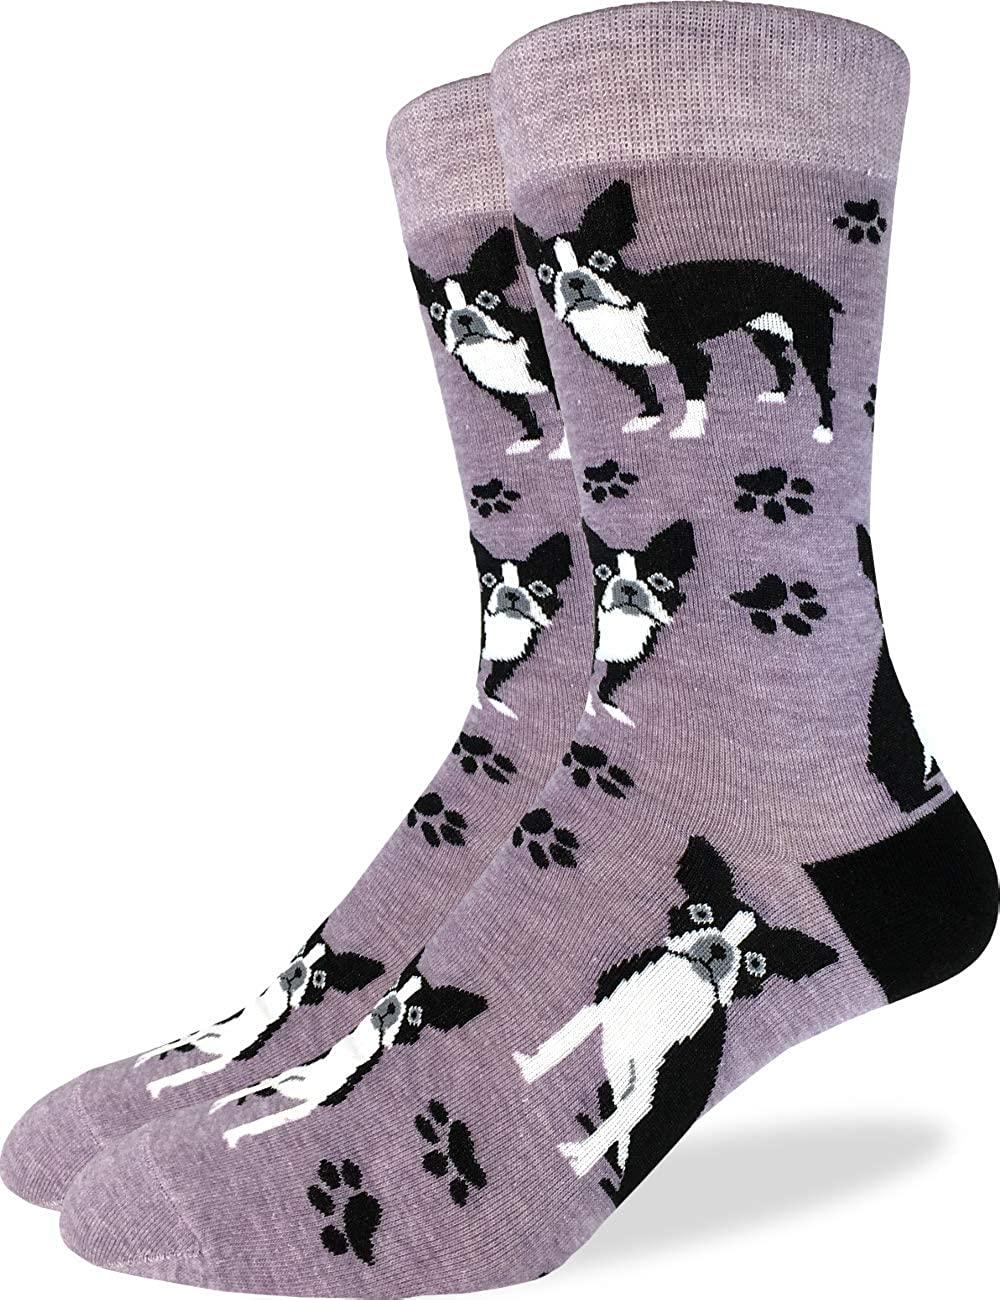 Good Luck Sock Men's Extra Large Boston Terrier Socks, Size 13-17, Big & Tall